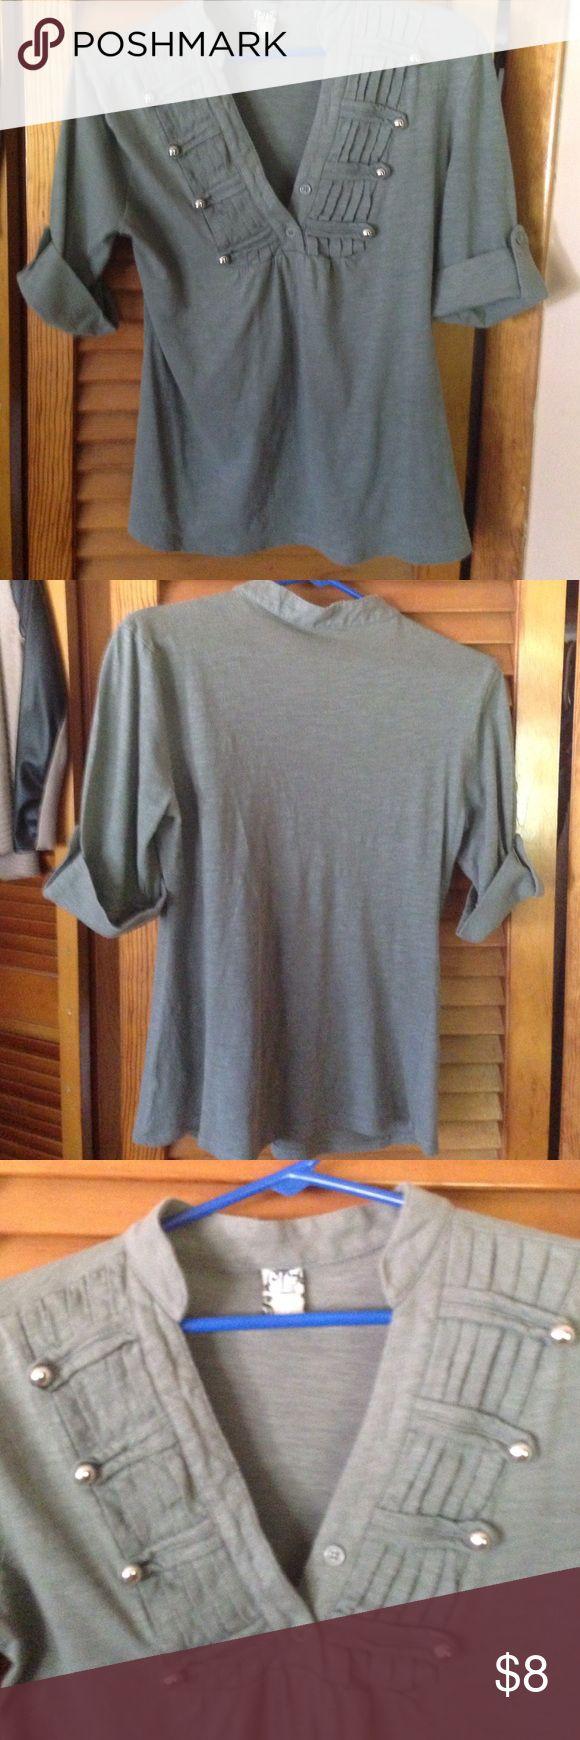 Cute top Greyish green military style top. Gently used Tops Tees - Short Sleeve